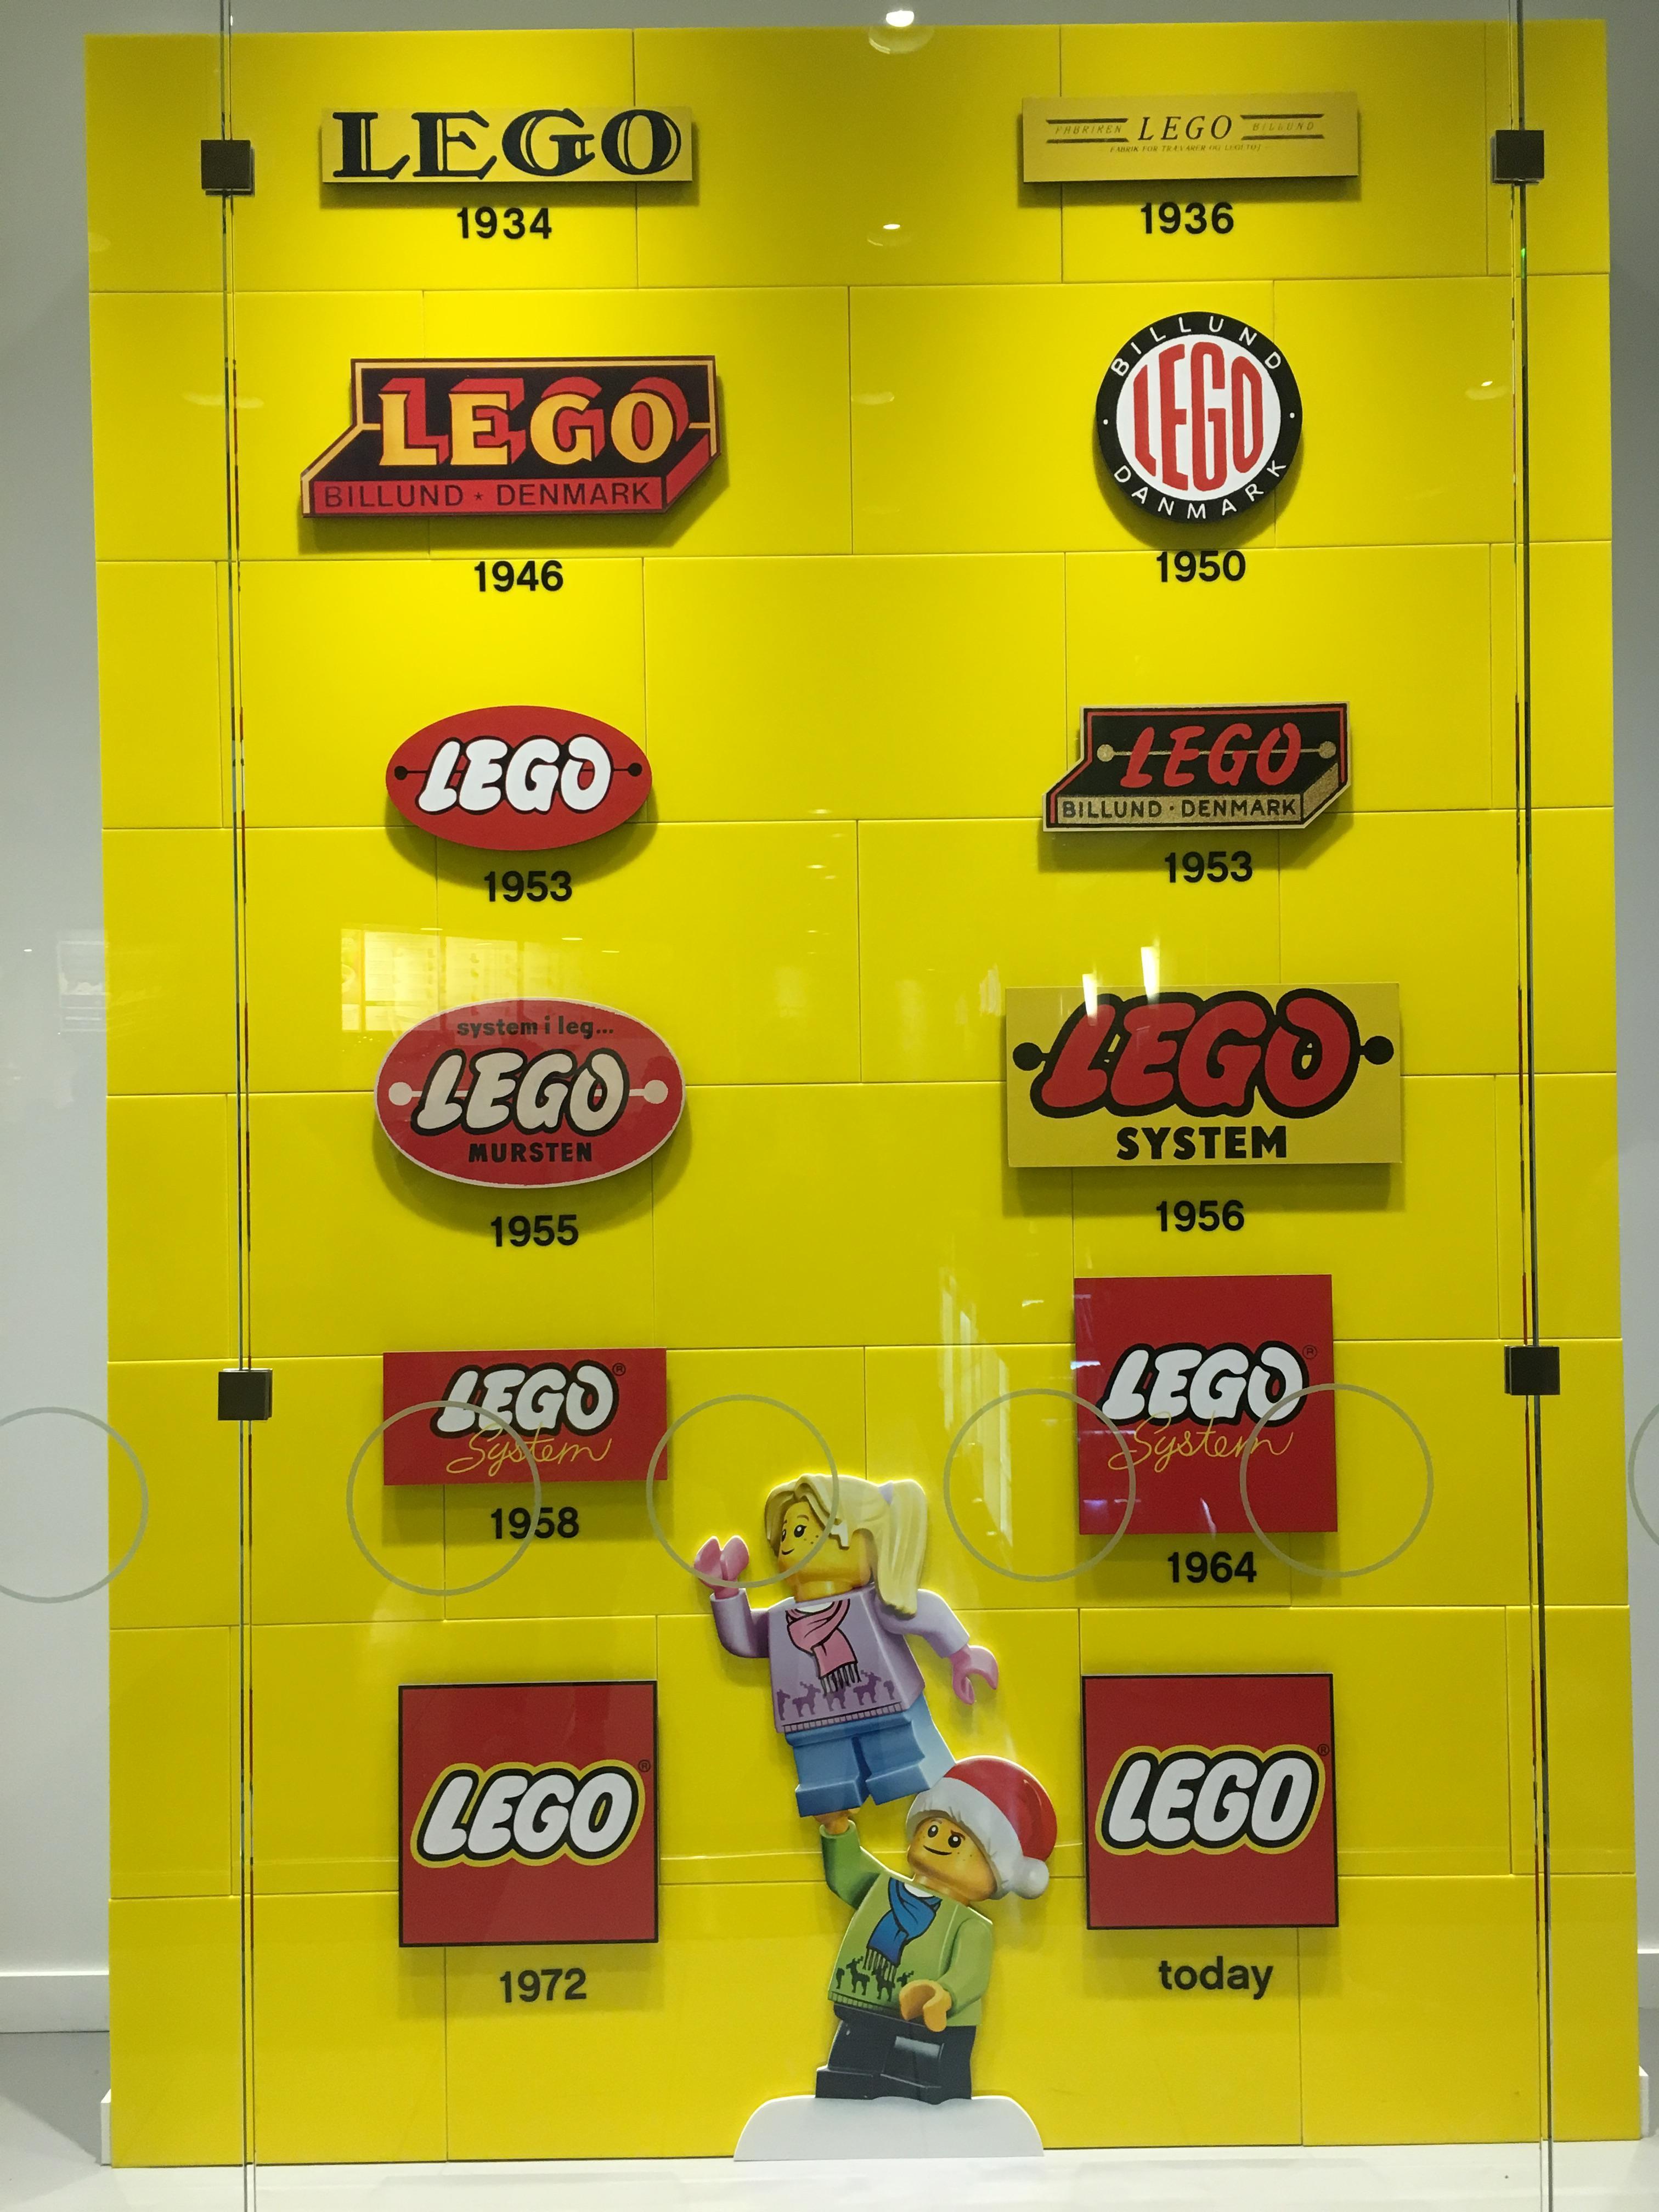 Lego logo history.